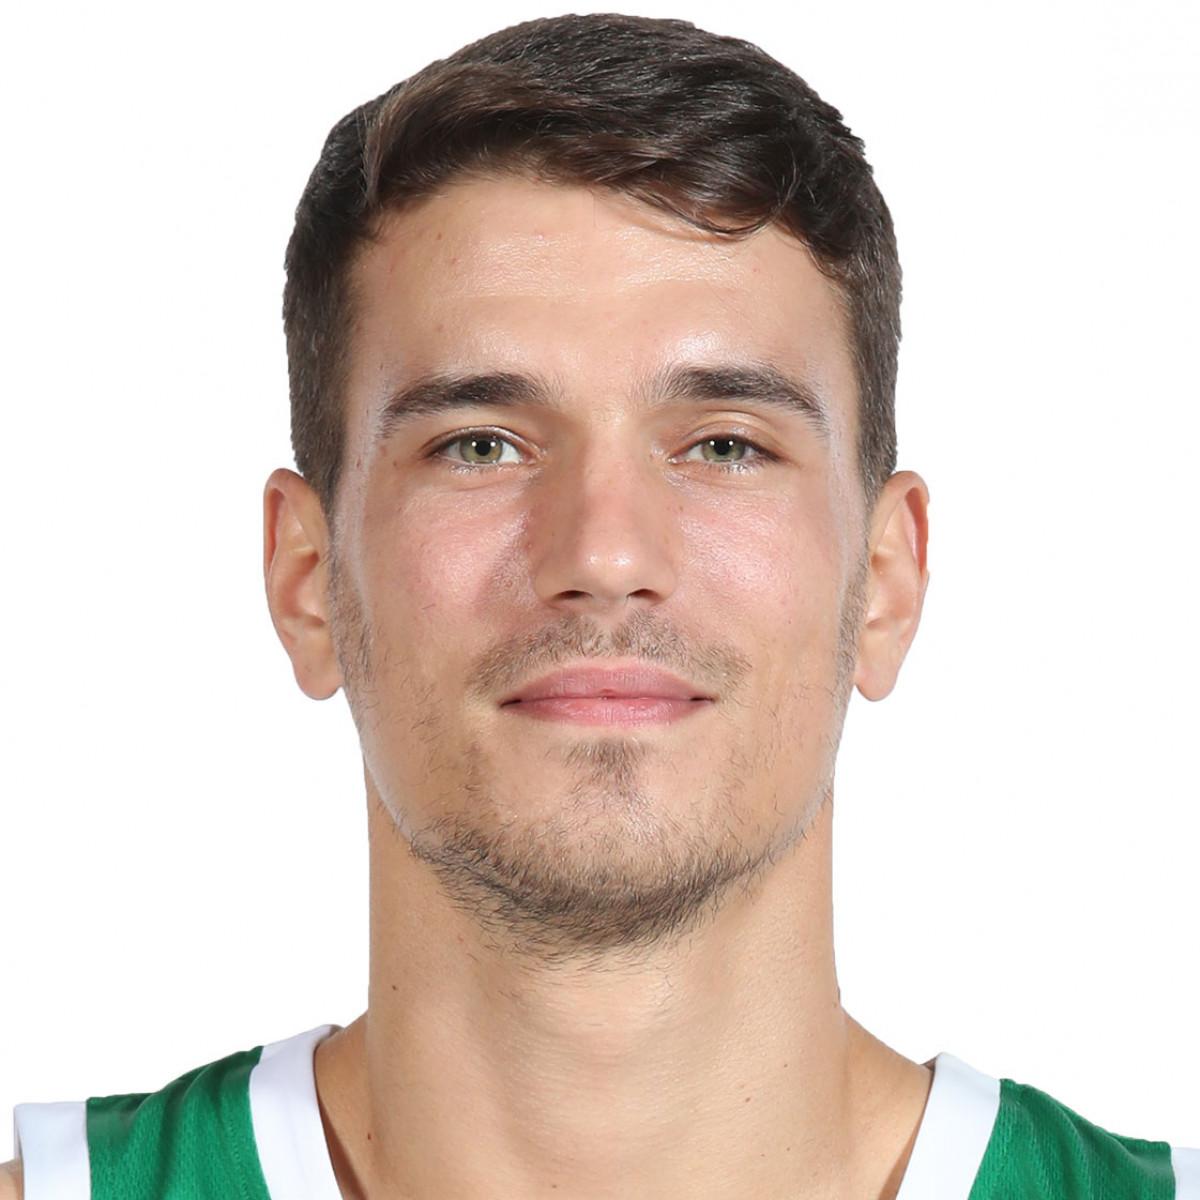 Filip Kruslin